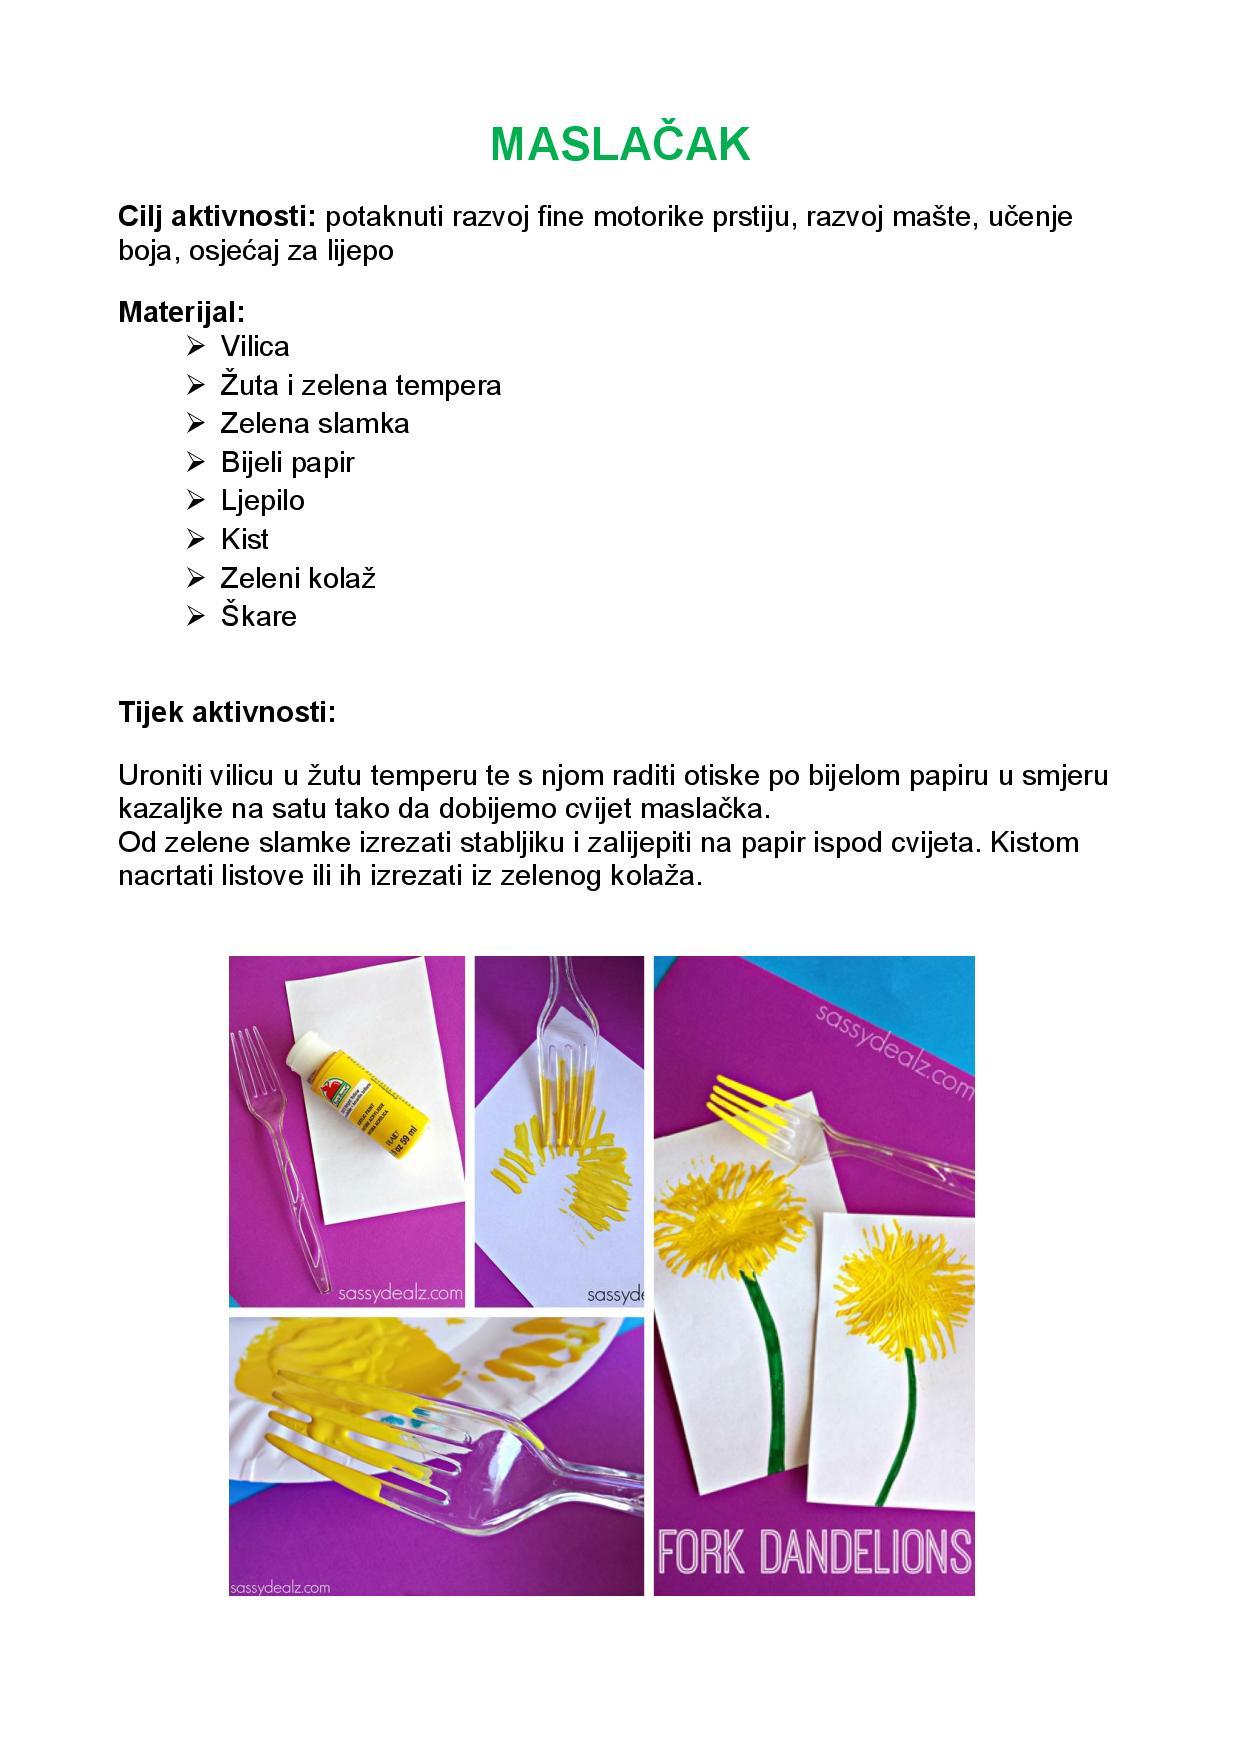 Maslačak 1 1   GRDELIN BUZET